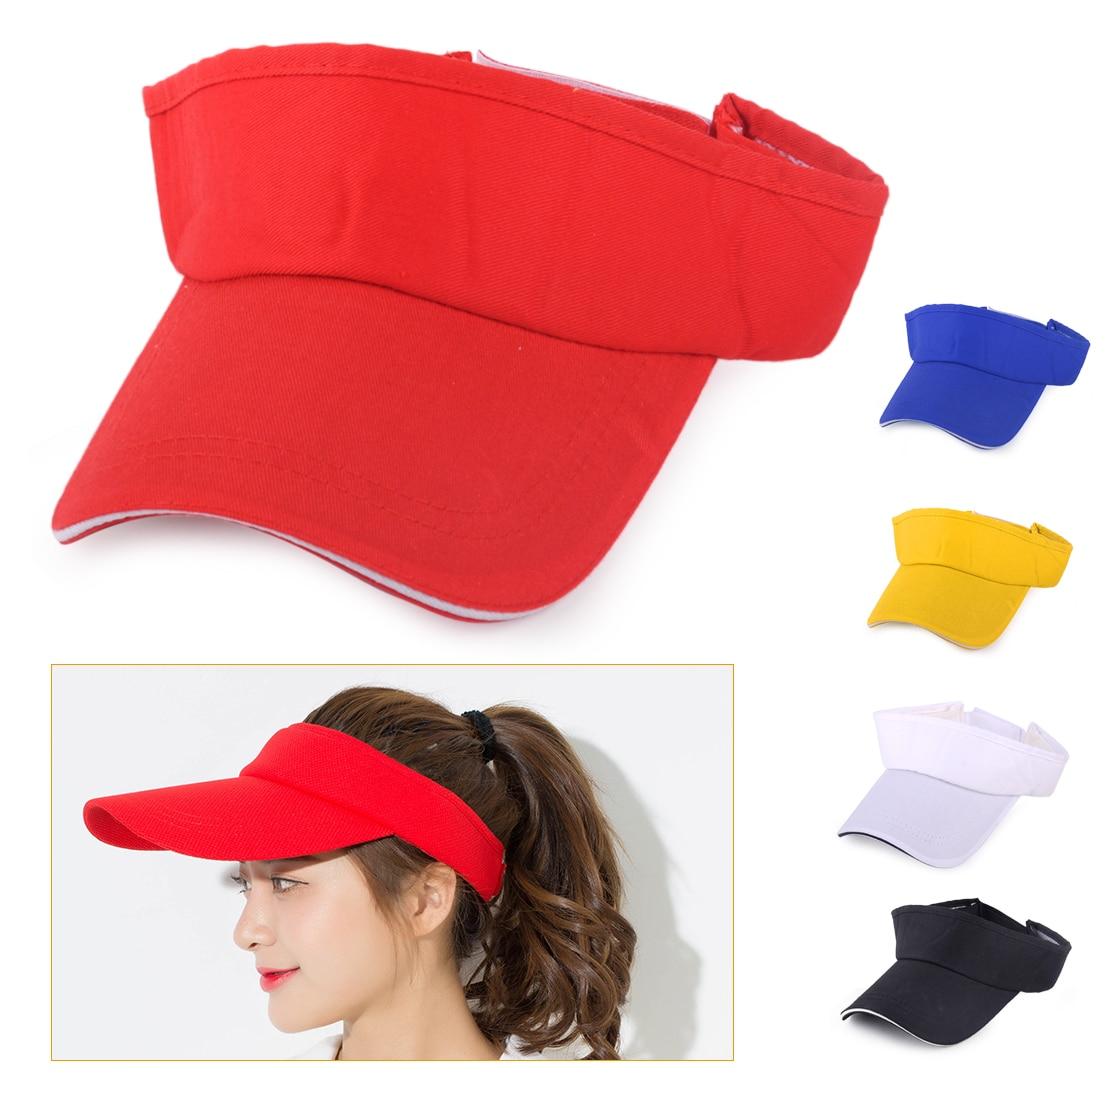 Adjustable Snapback Sun Hat Tennis Caps Men Women Outdoor Beach Sports Solid Color Visor Hats Unisex Baseball Golf Cotton Cap